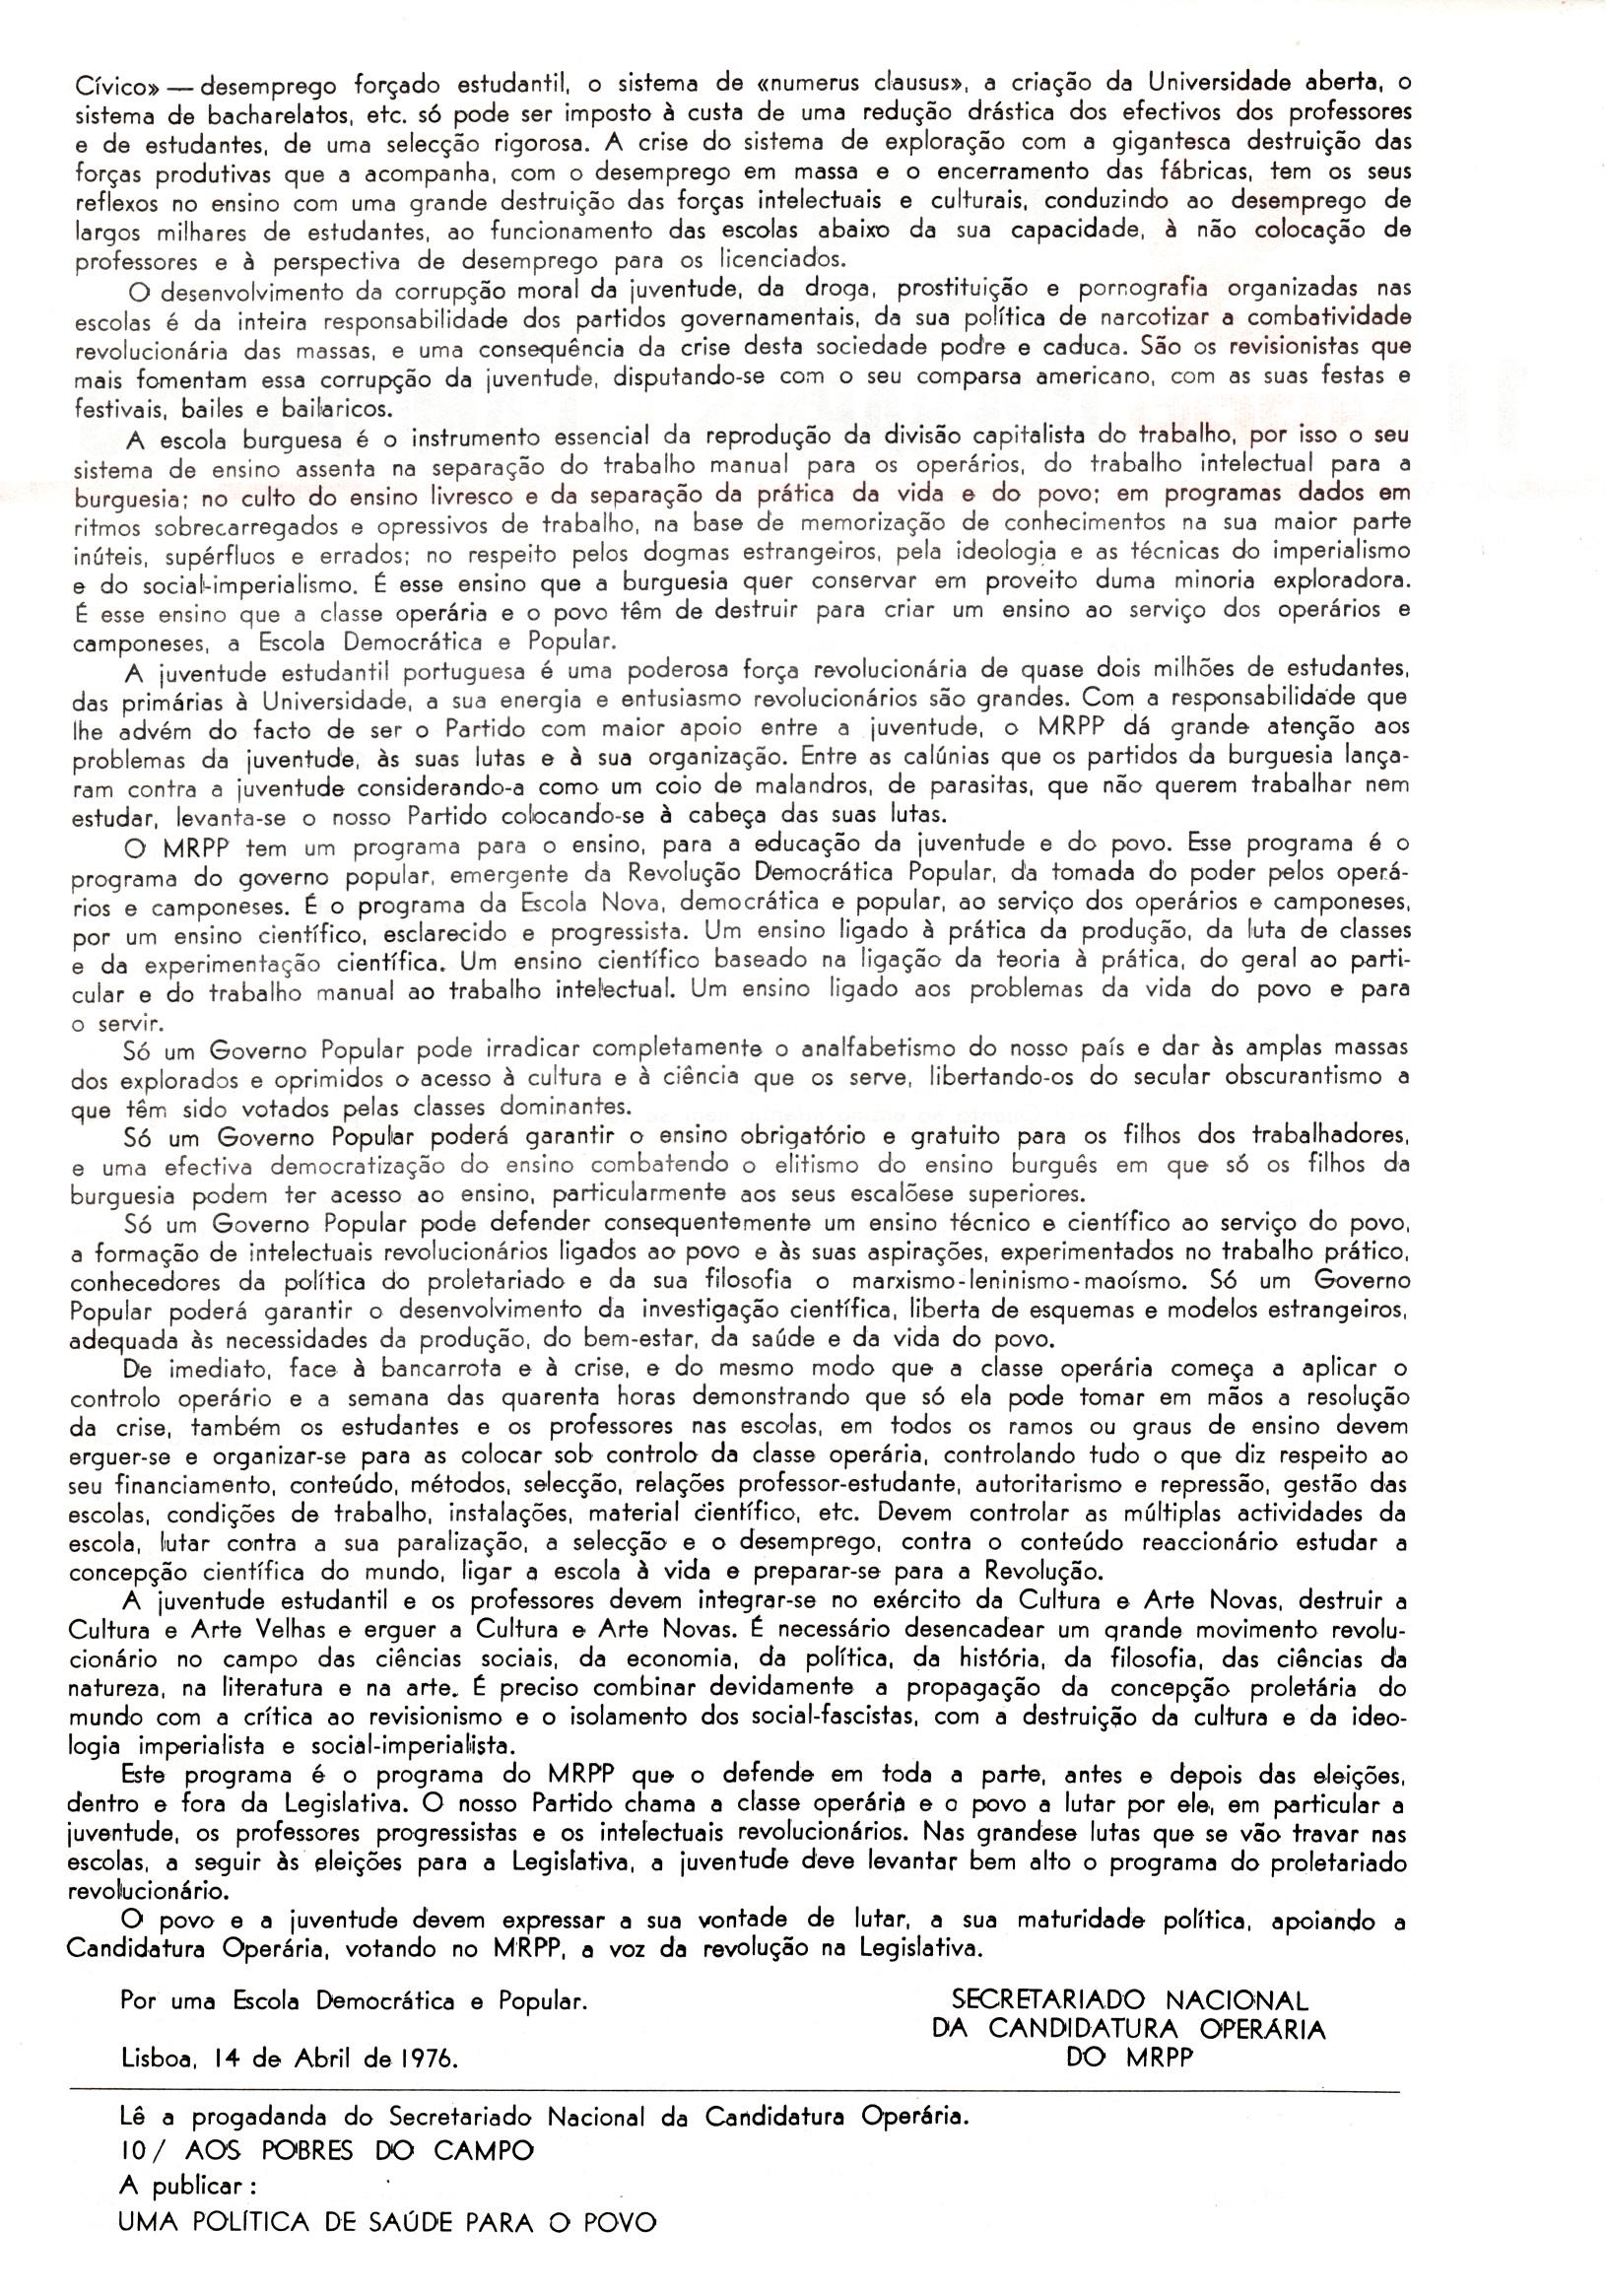 mrpp_1976_eleicao_programa_0022